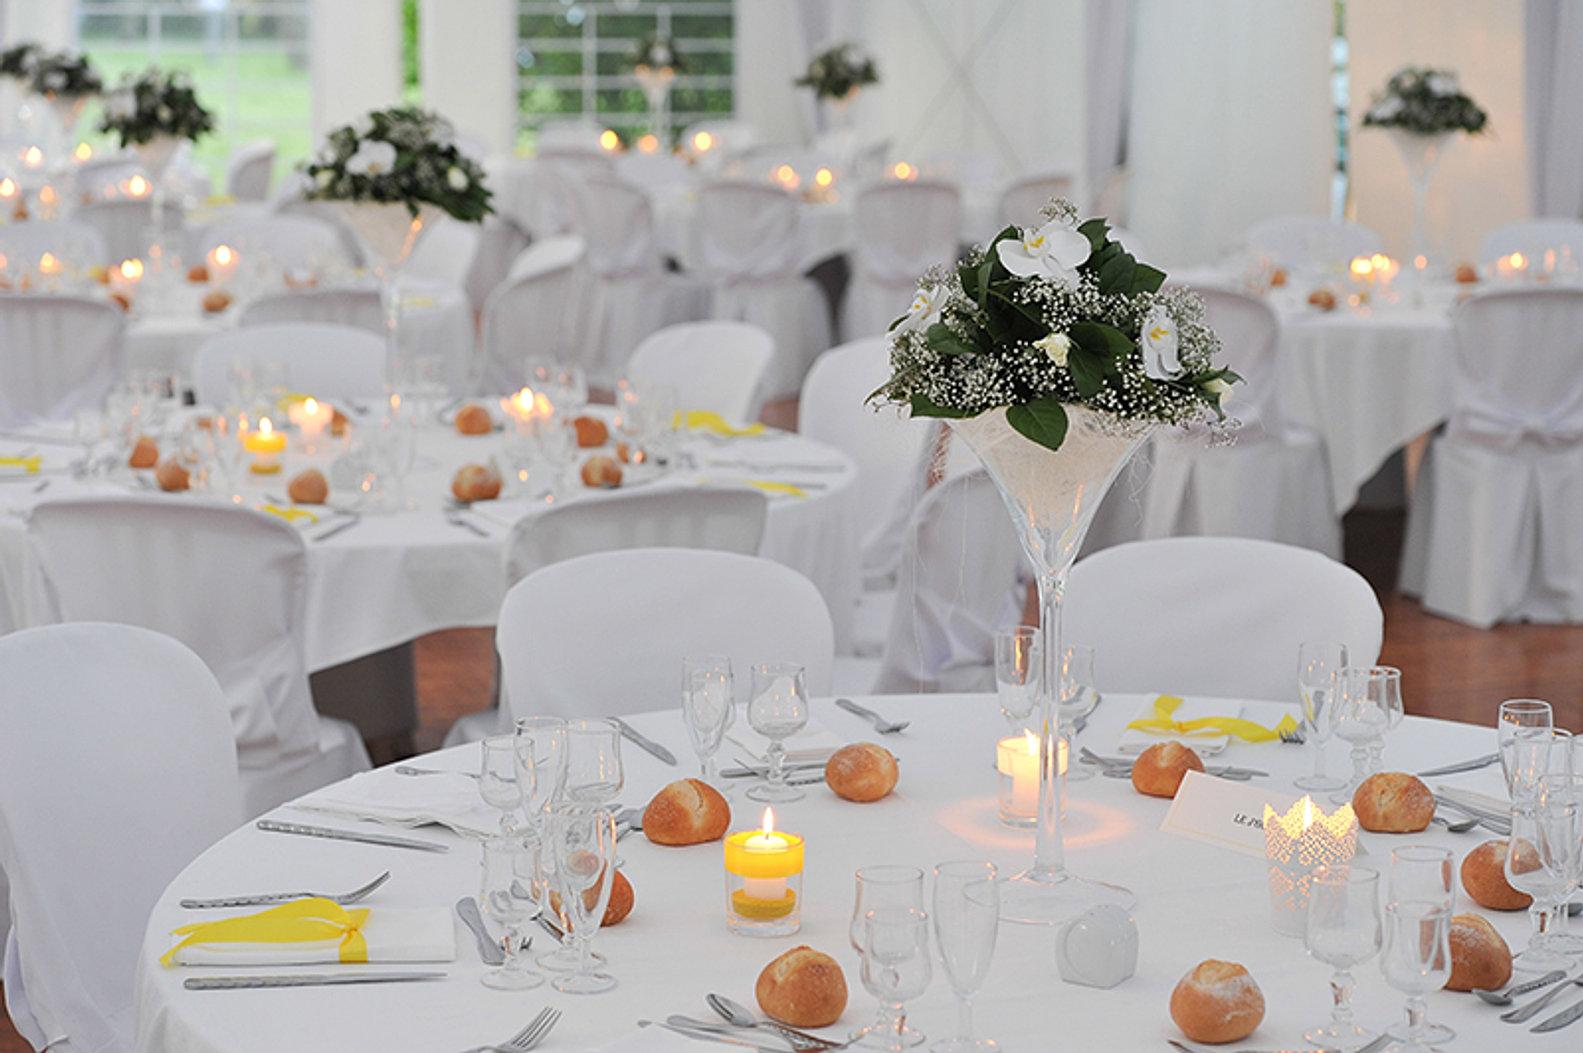 deco table mariage vase martini. Black Bedroom Furniture Sets. Home Design Ideas